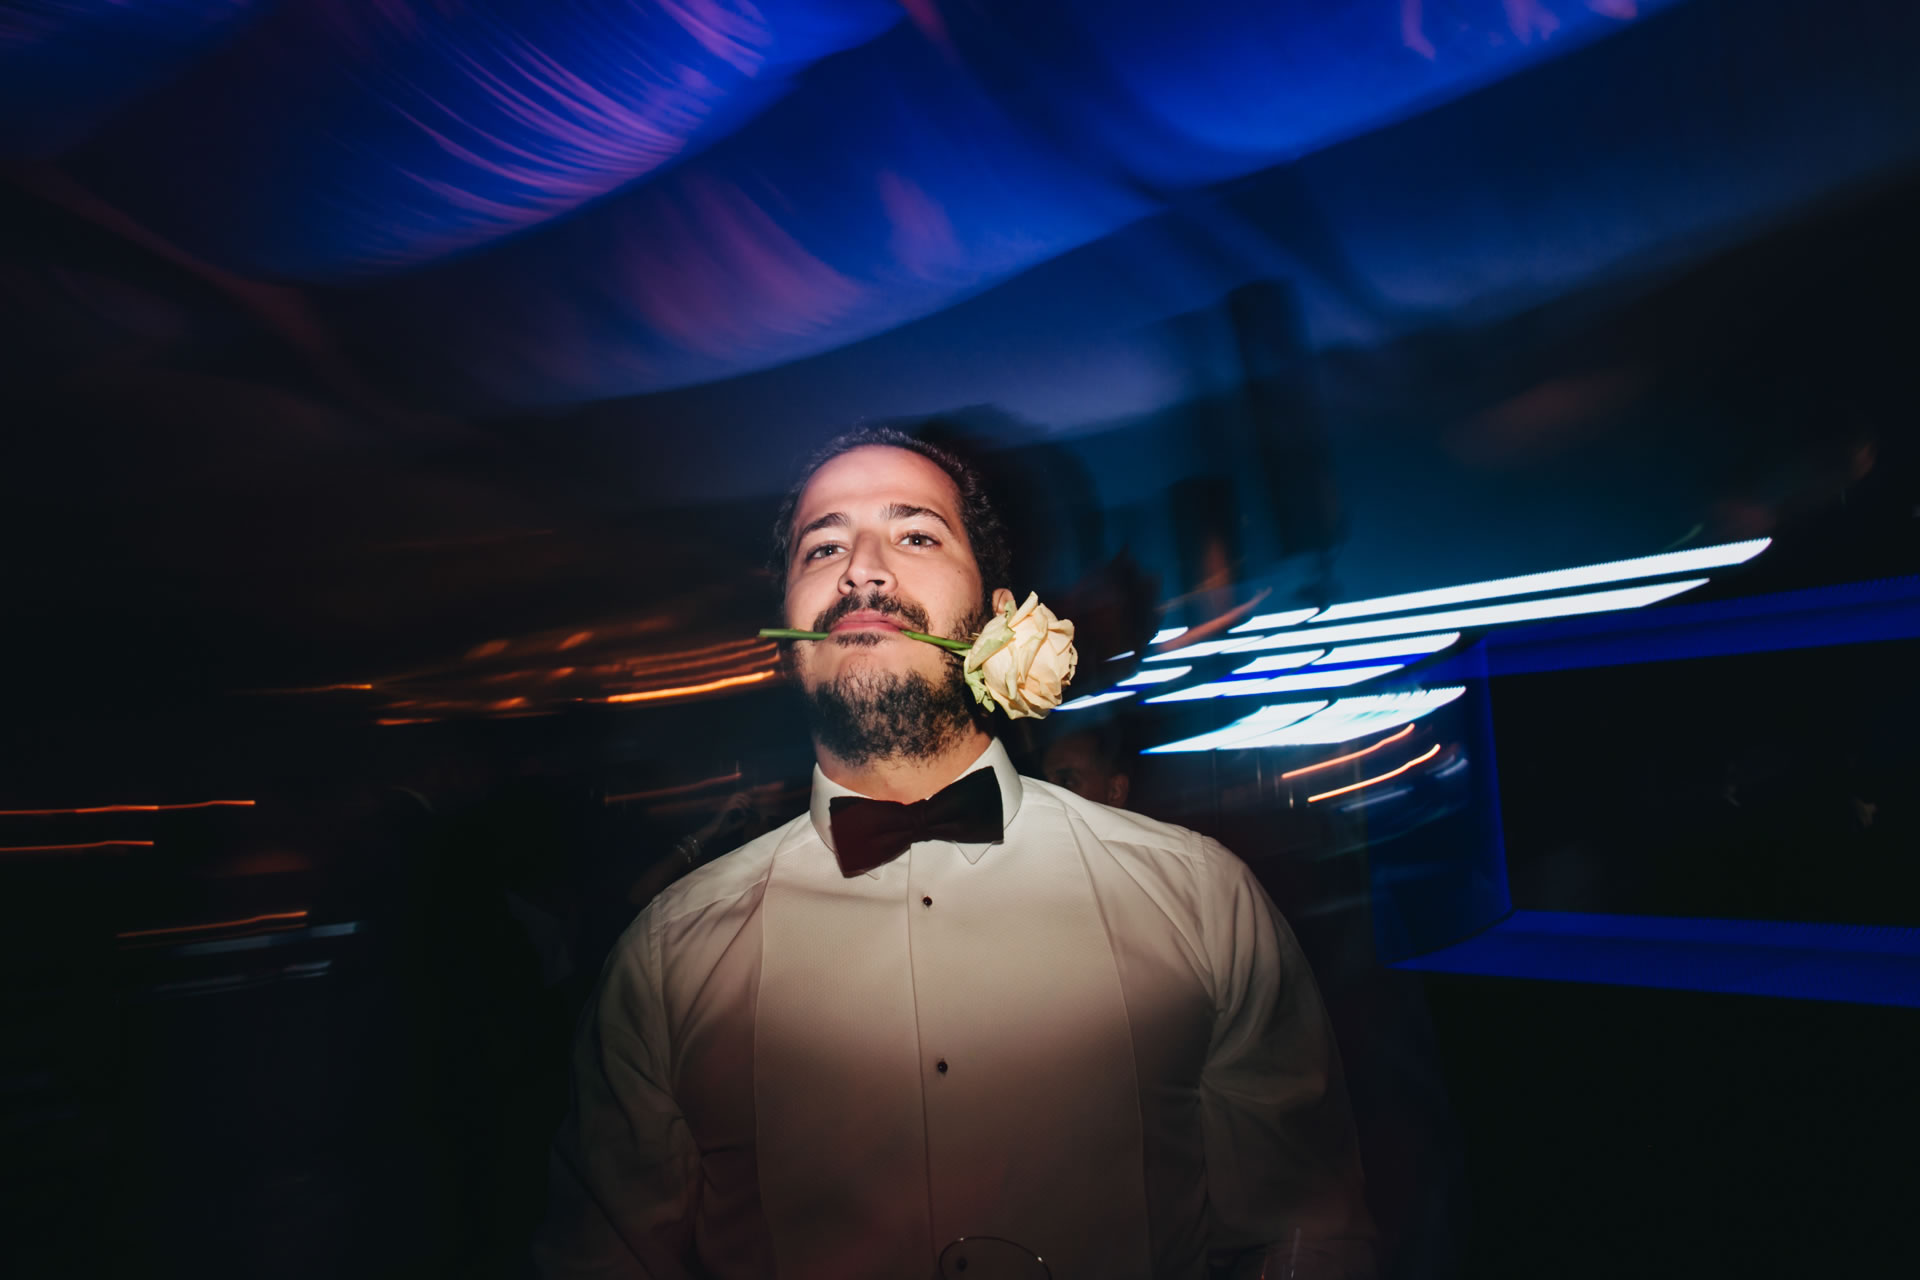 Speed - 90 :: Luxury wedding at Il Borro :: Luxury wedding photography - 89 :: Speed - 90